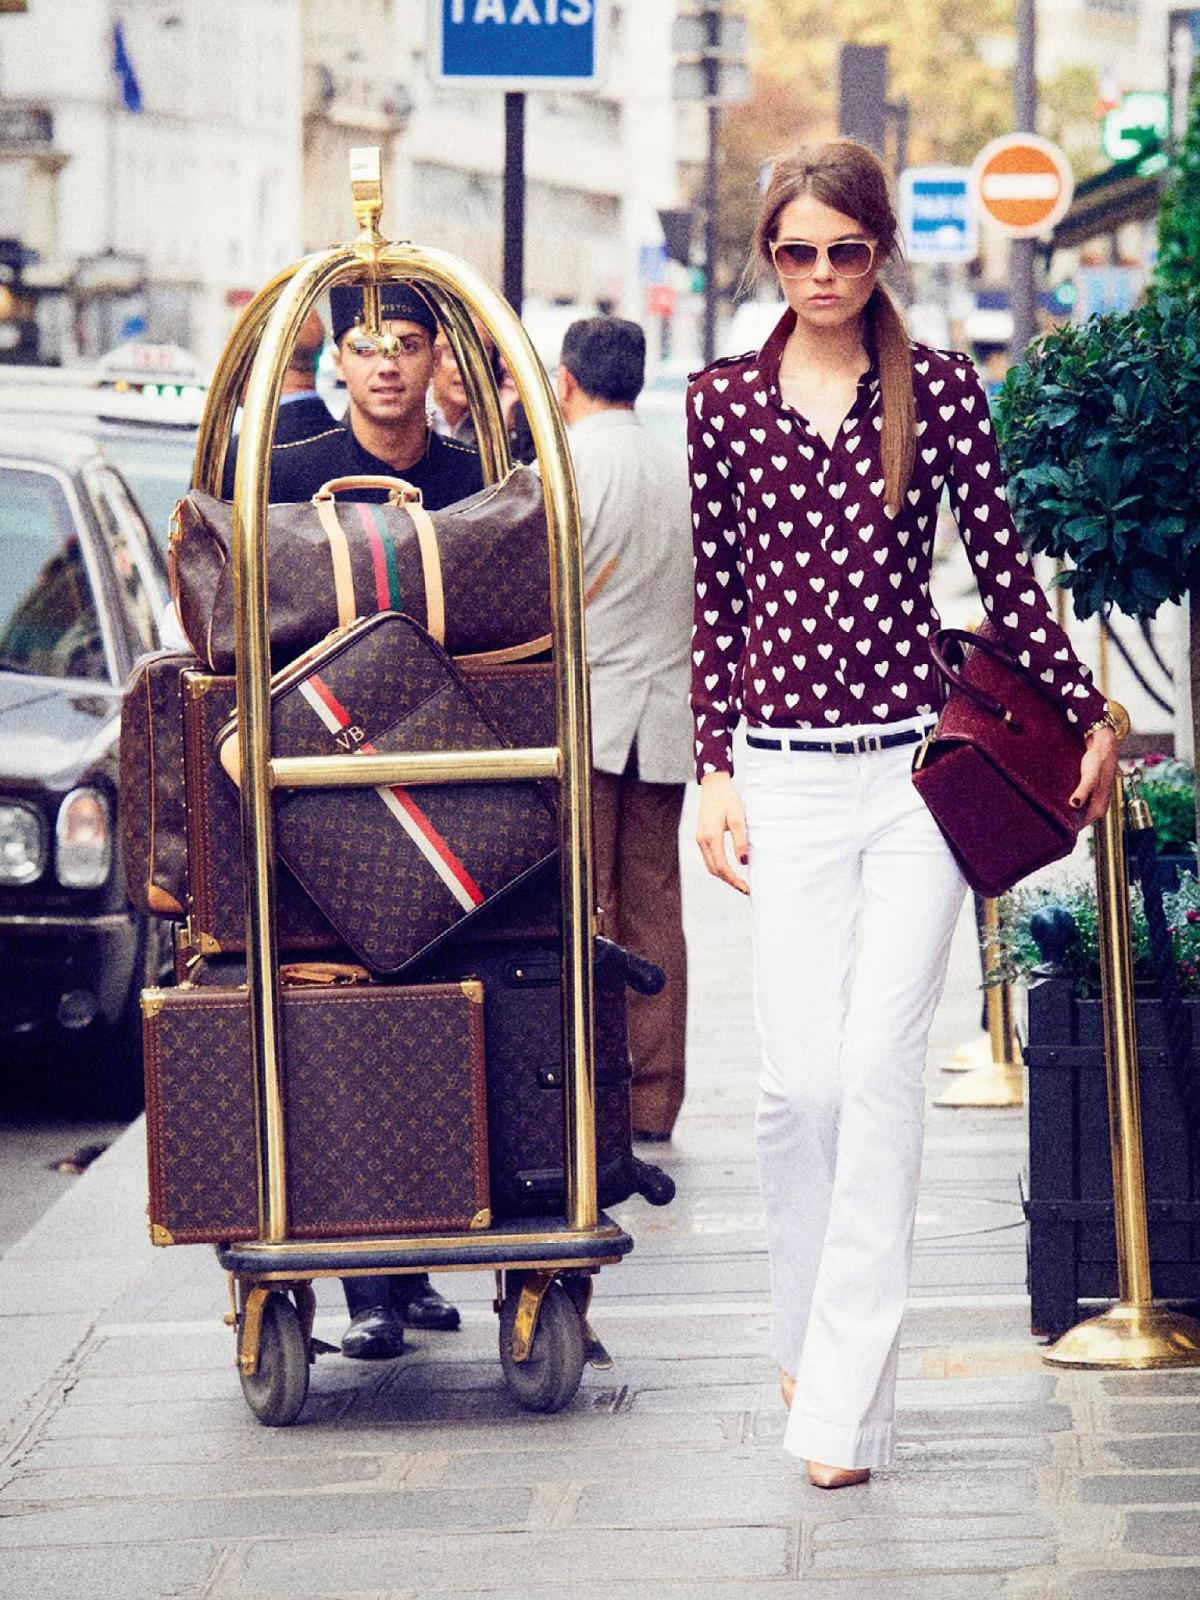 cab34df2781 Caroline Brasch Nielsen by Terry Richardson for Vogue Paris December 2013    January 2014 December 2013